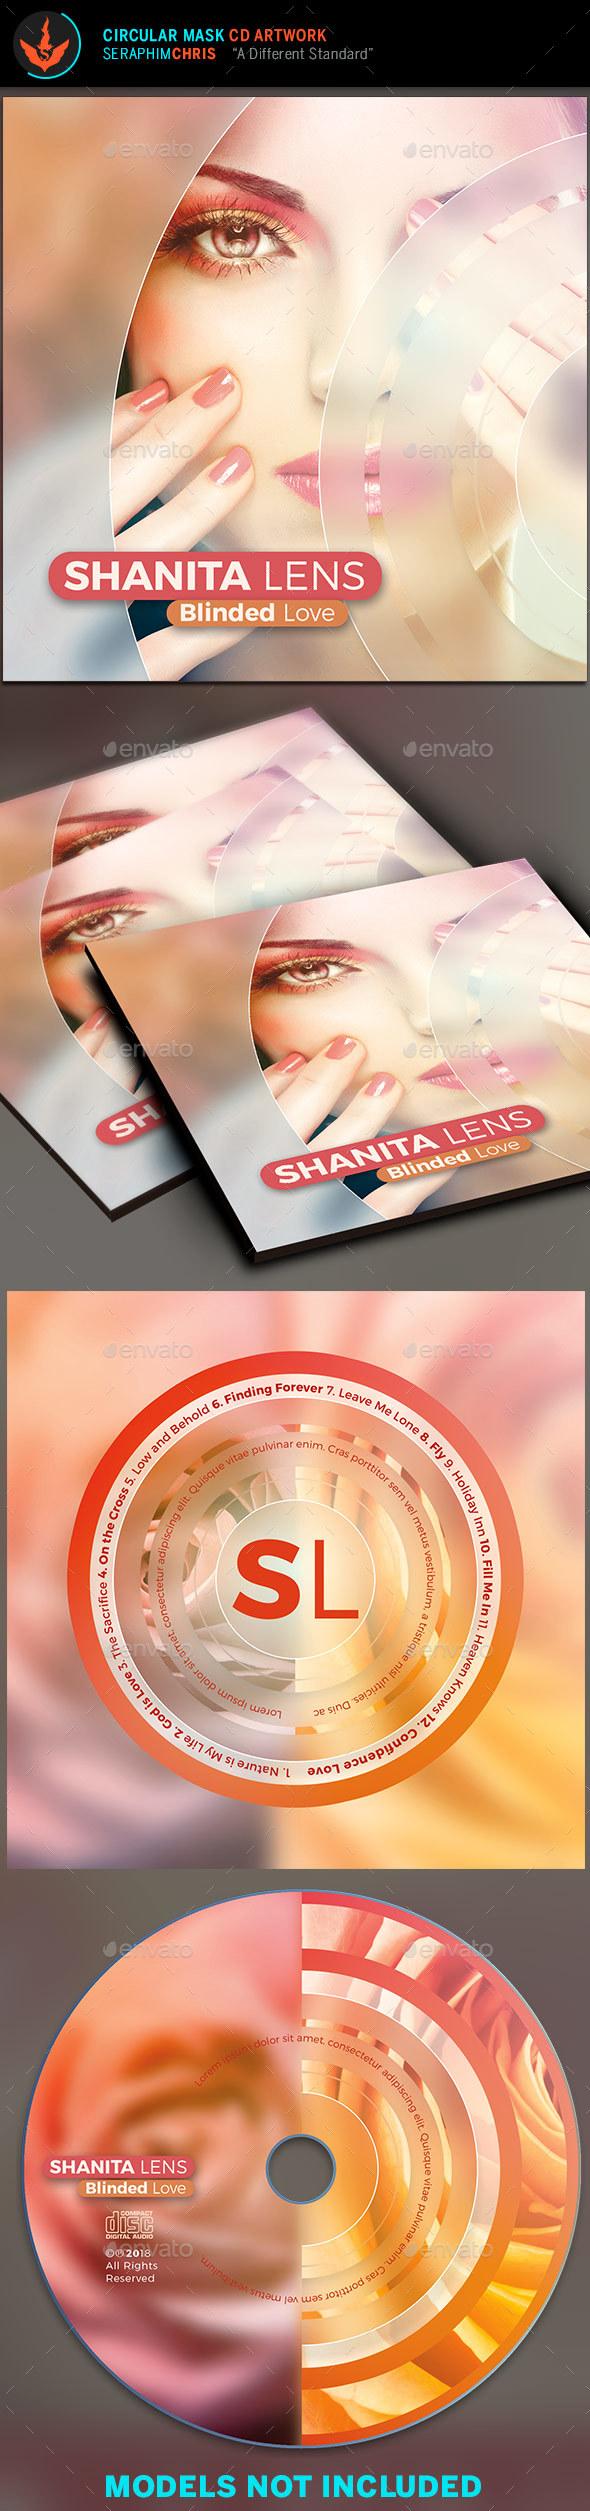 Circular Mask CD Artwork Template - CD & DVD Artwork Print Templates